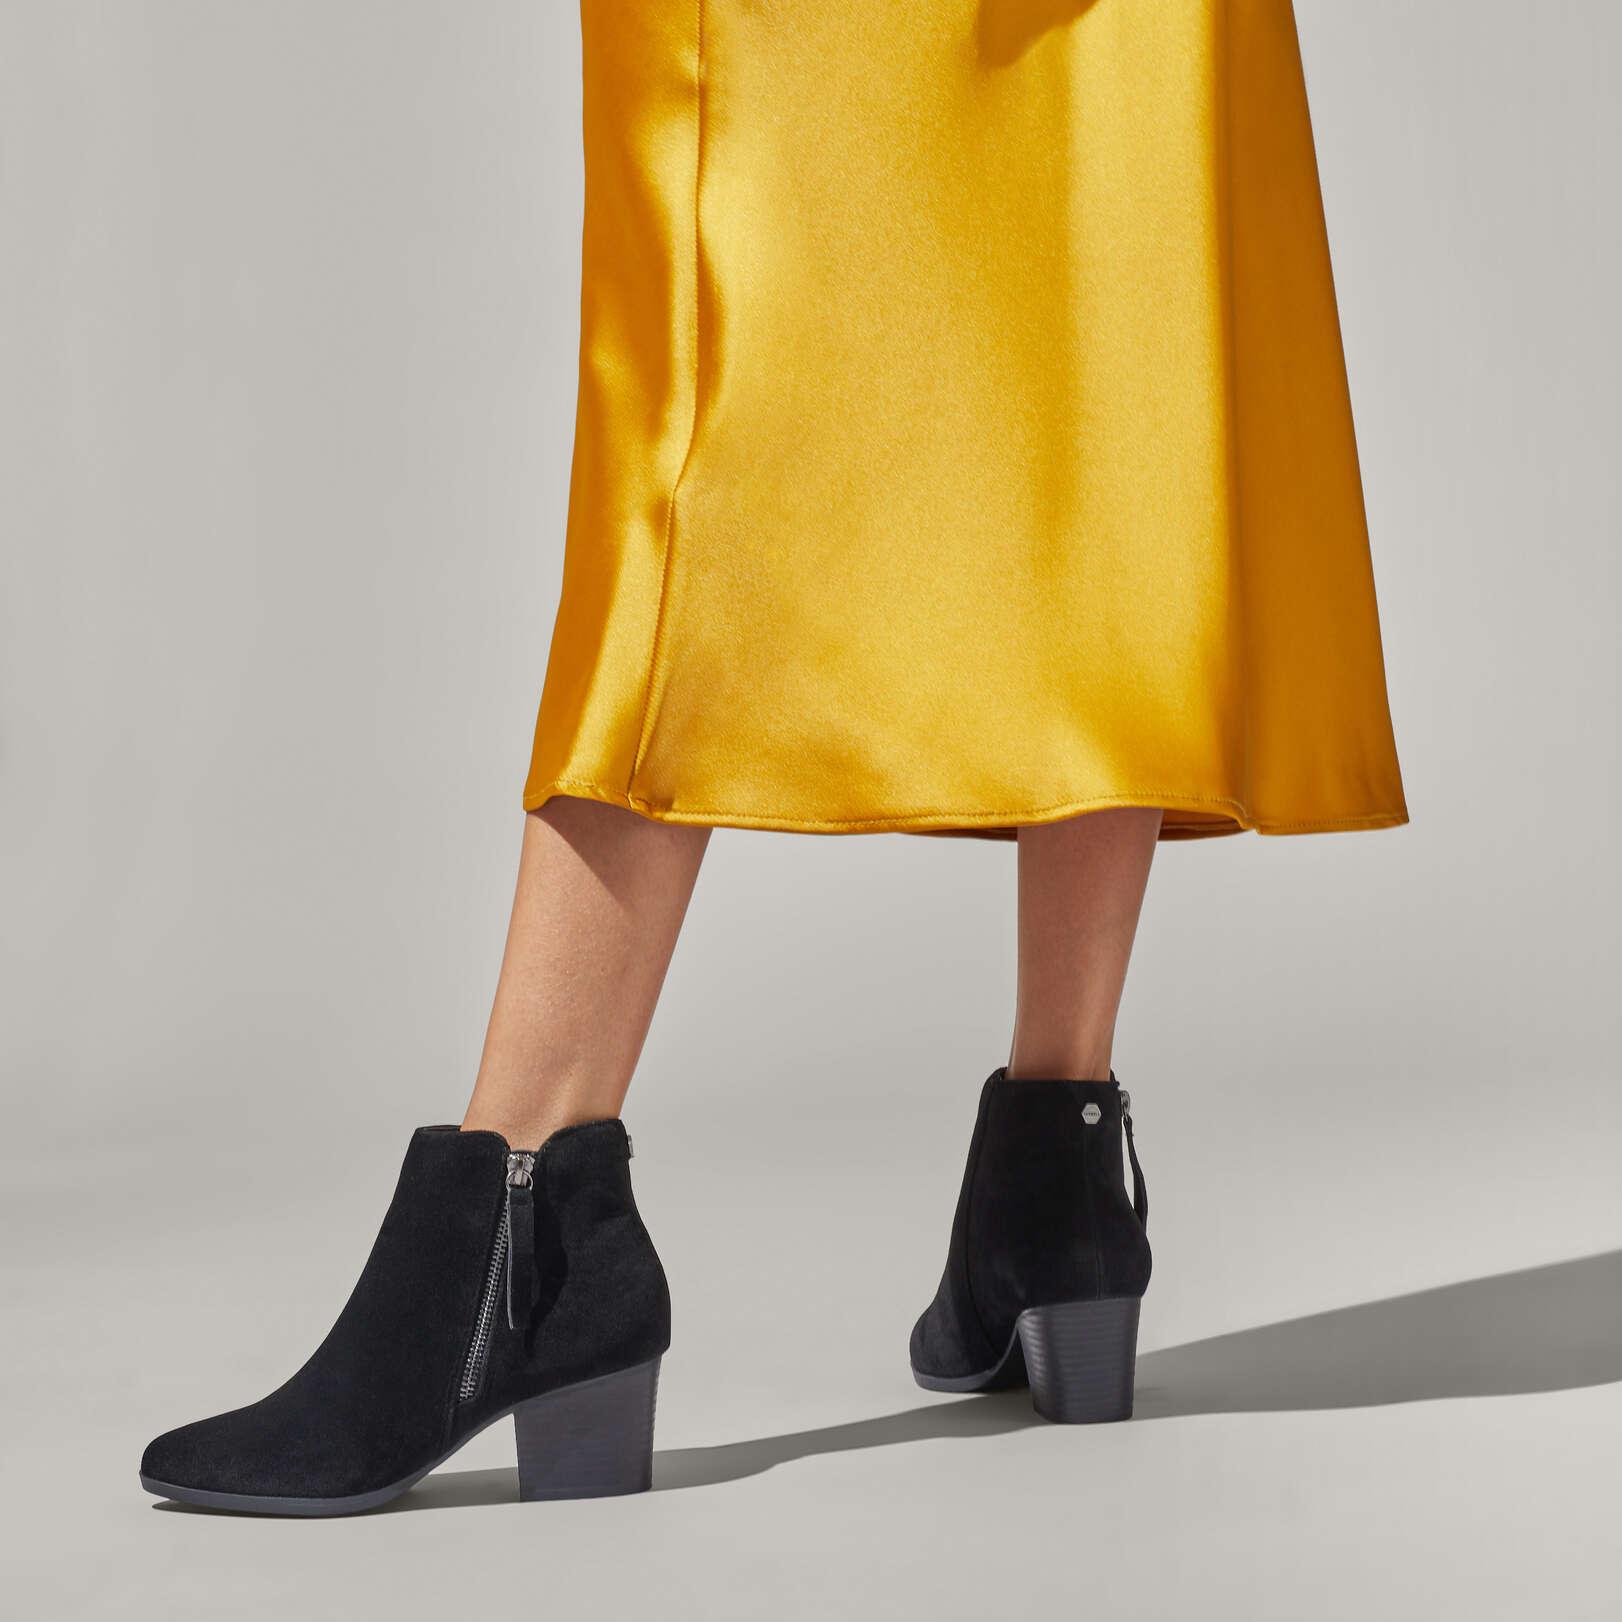 TESSA - CARVELA COMFORT Ankle Boots